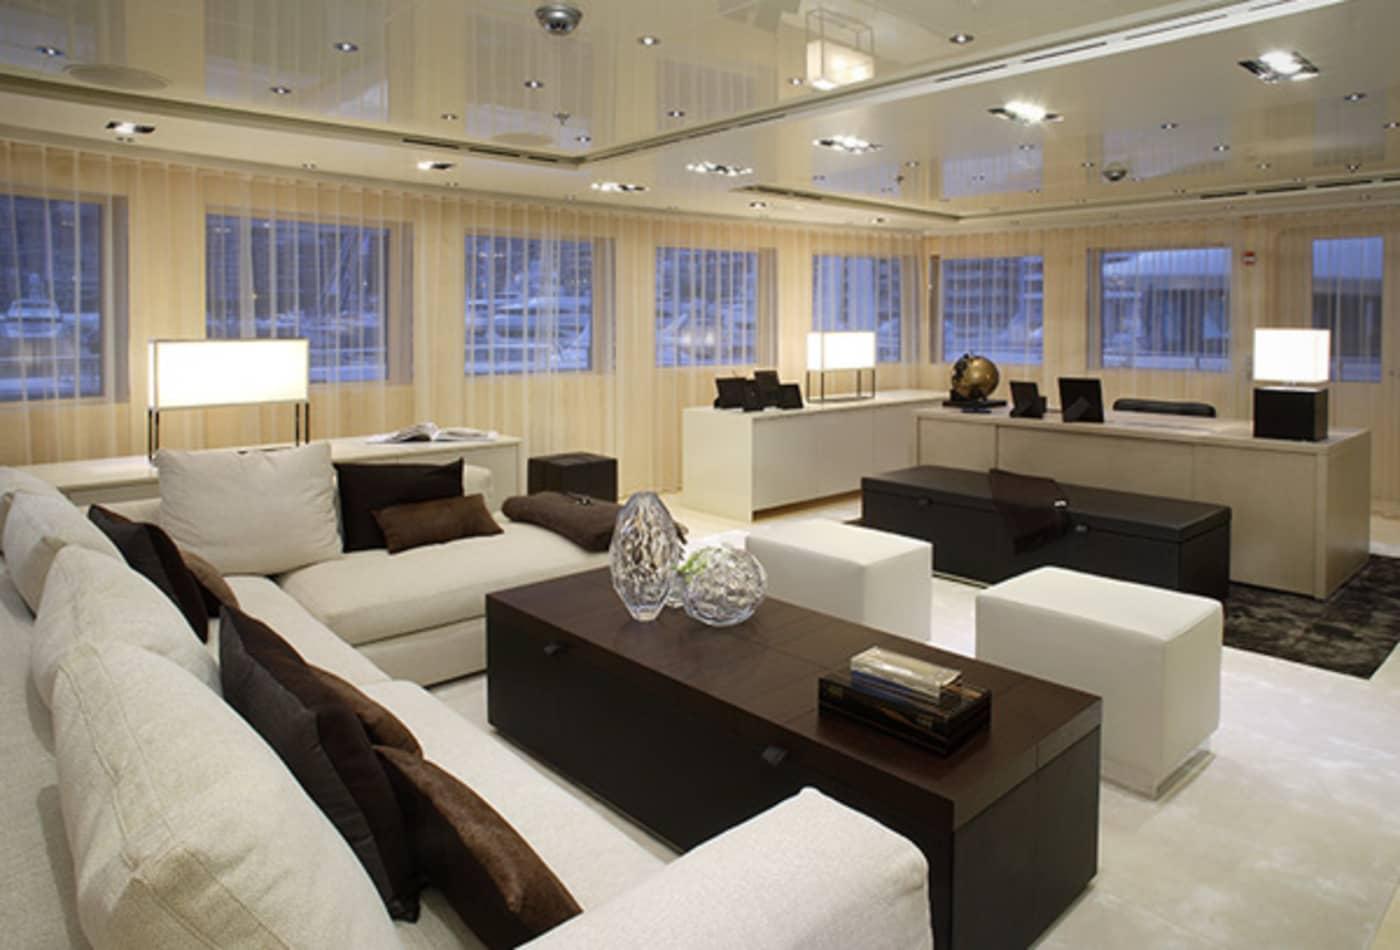 Yachts-at-a-discount-icon-interior.jpg